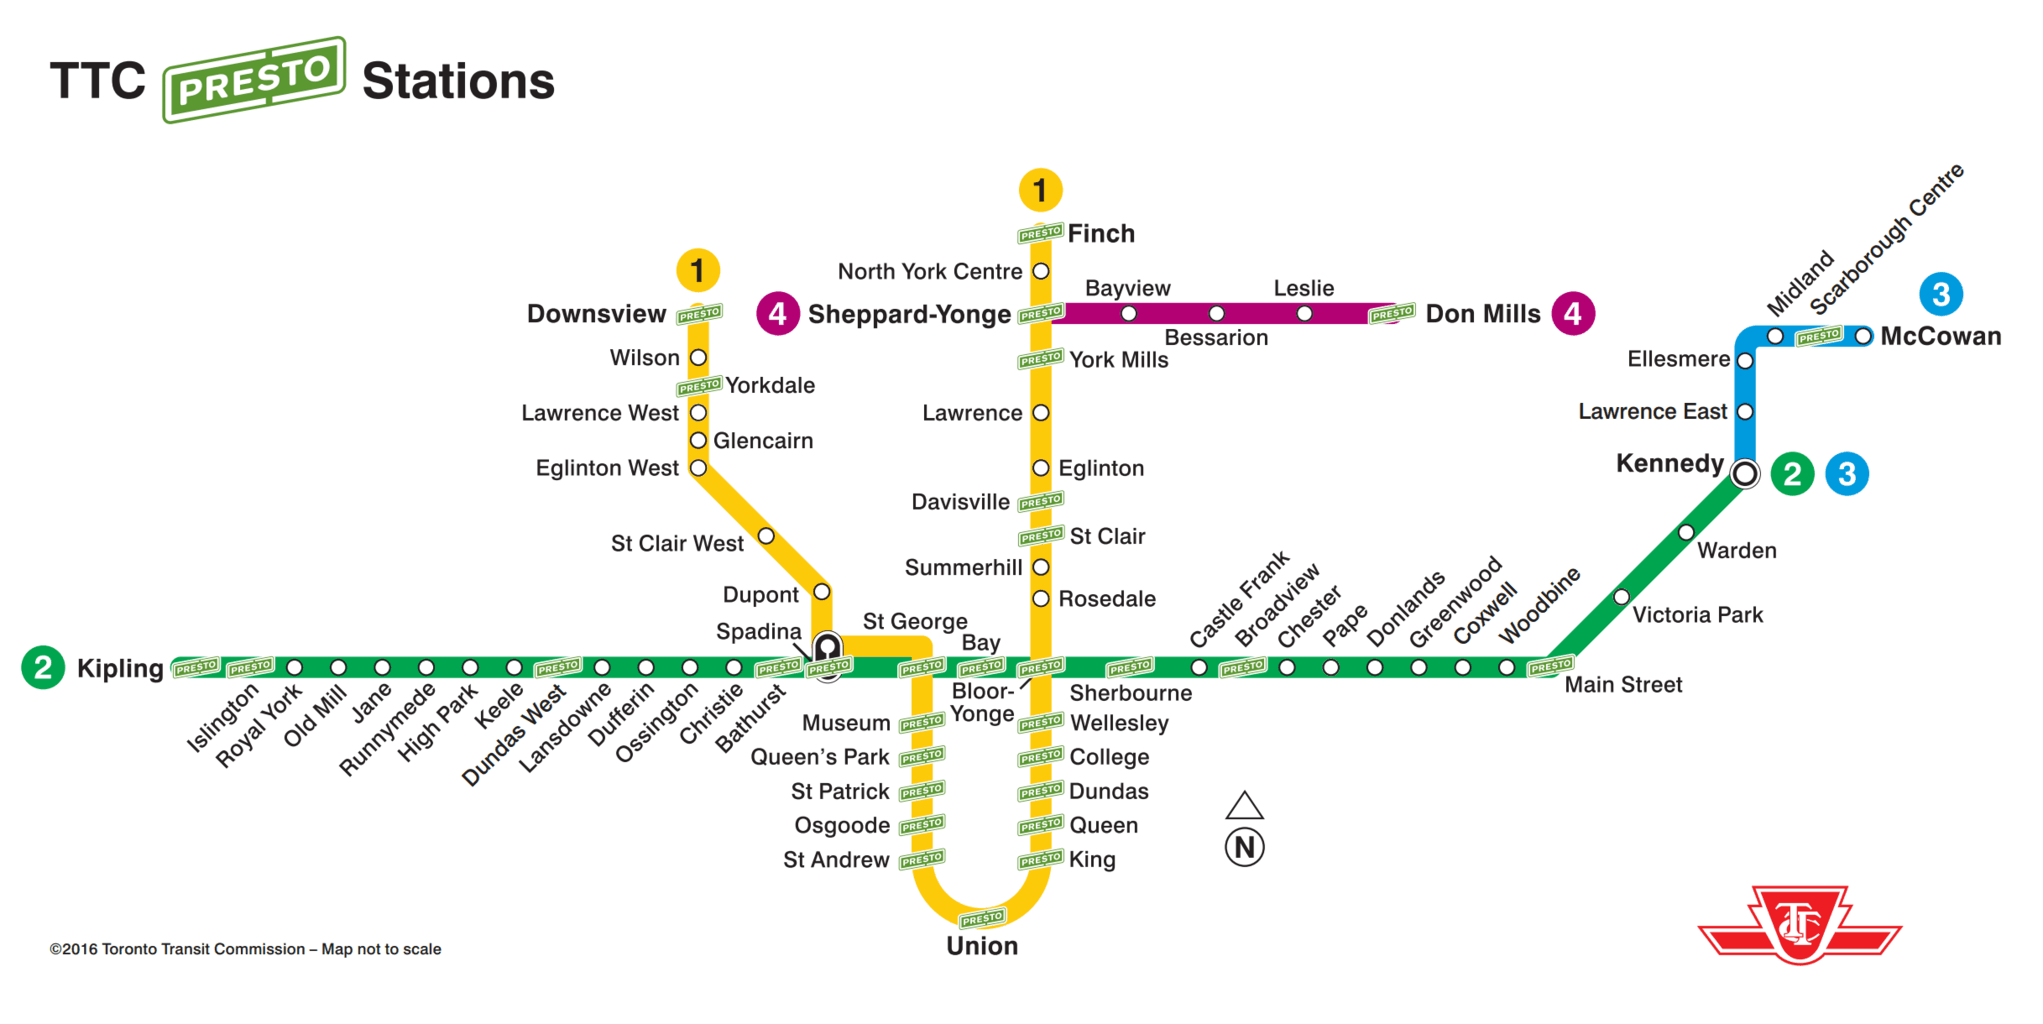 Toronto TTC Subway PRESTO stations - Get Around Toronto